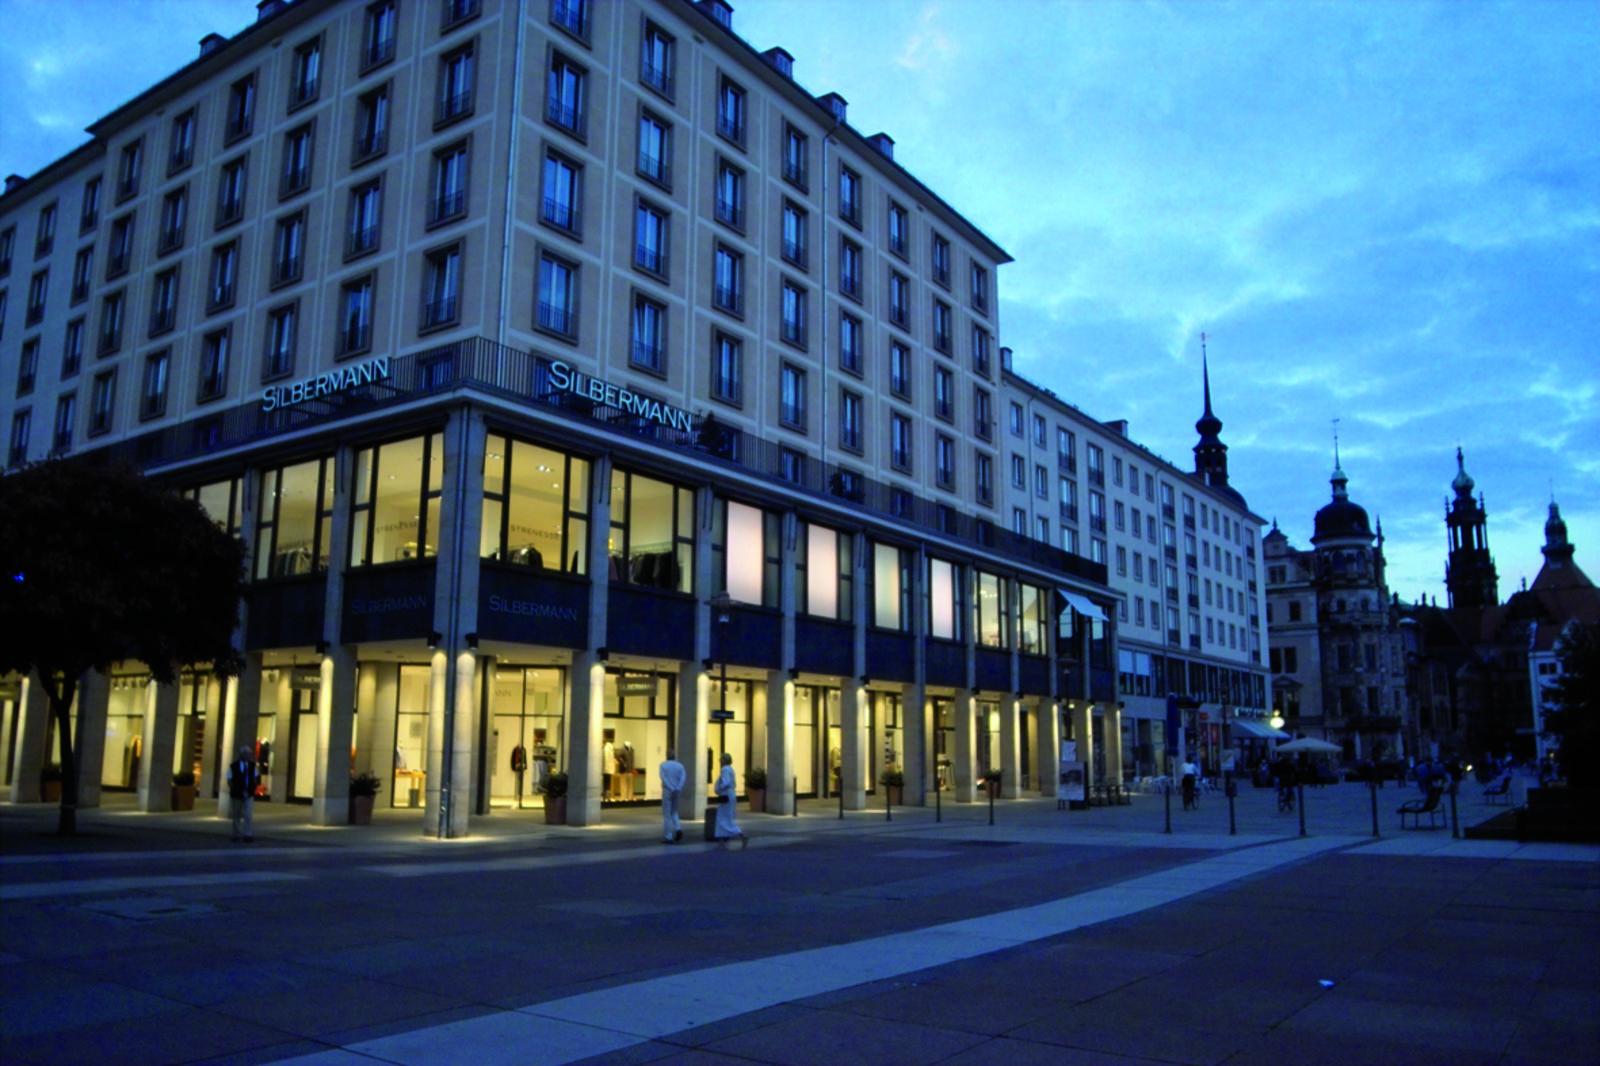 SILBERMANN in Dresden (Bild 4)